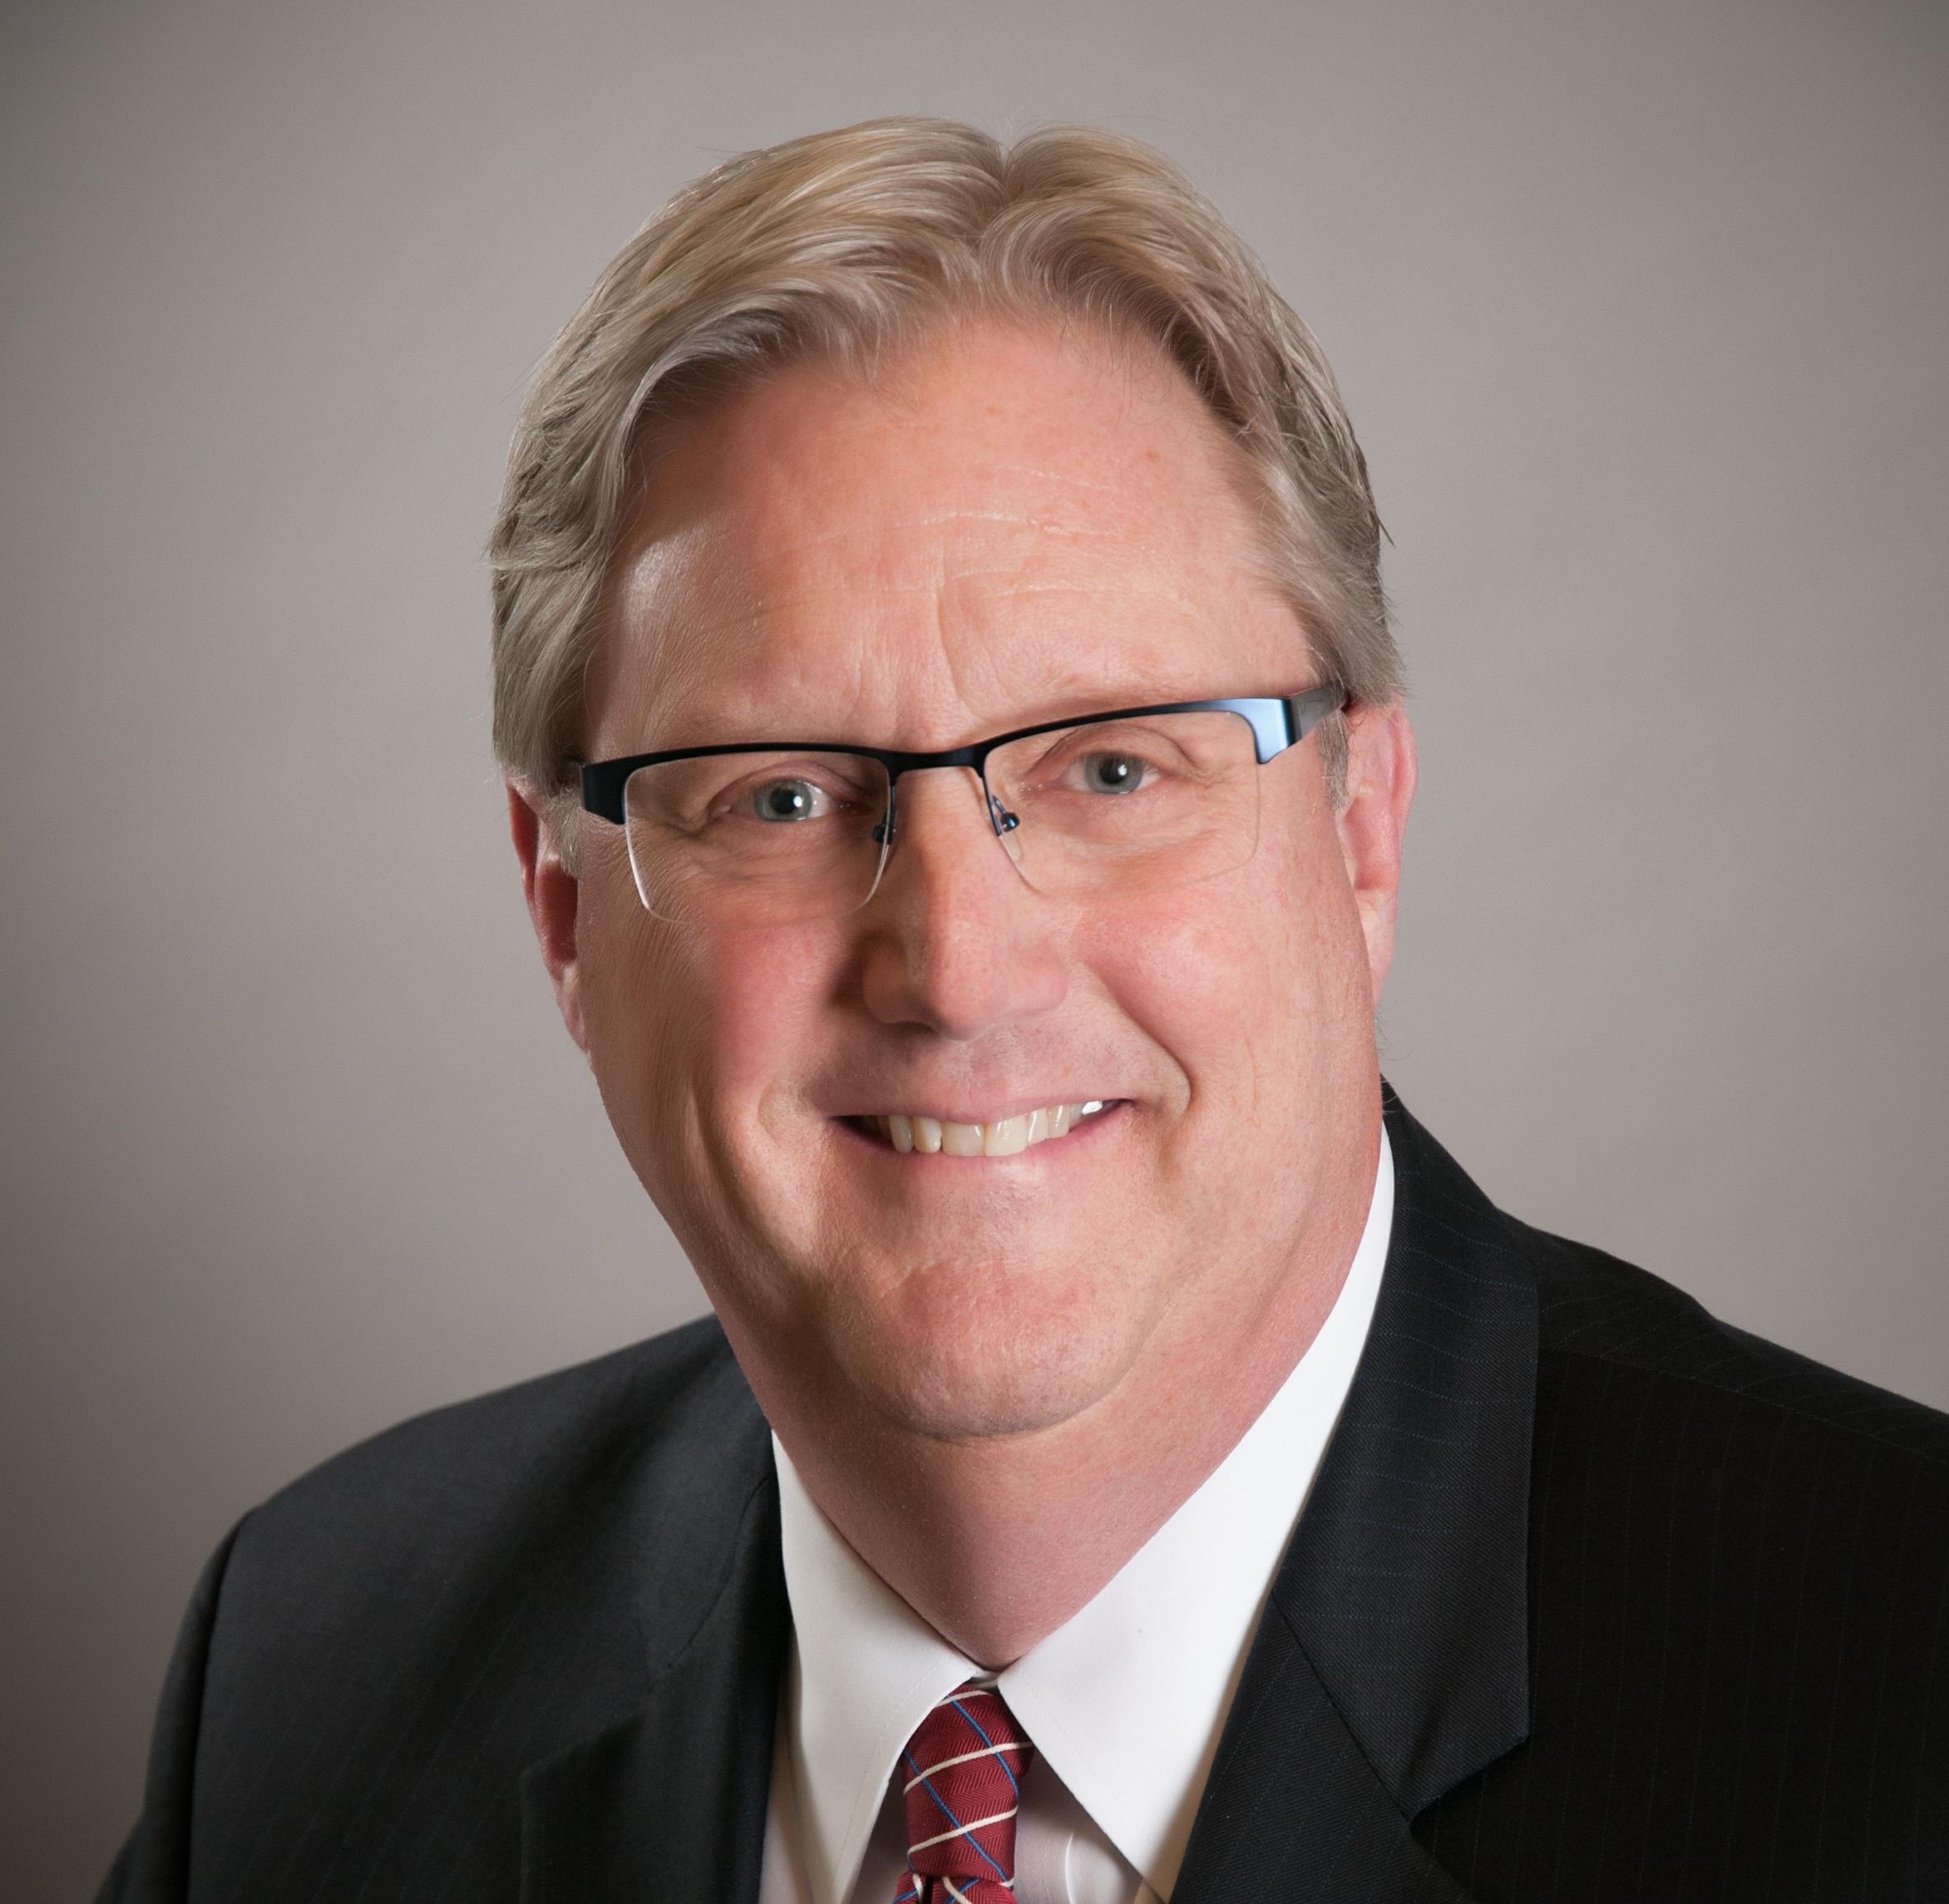 Mark Schau